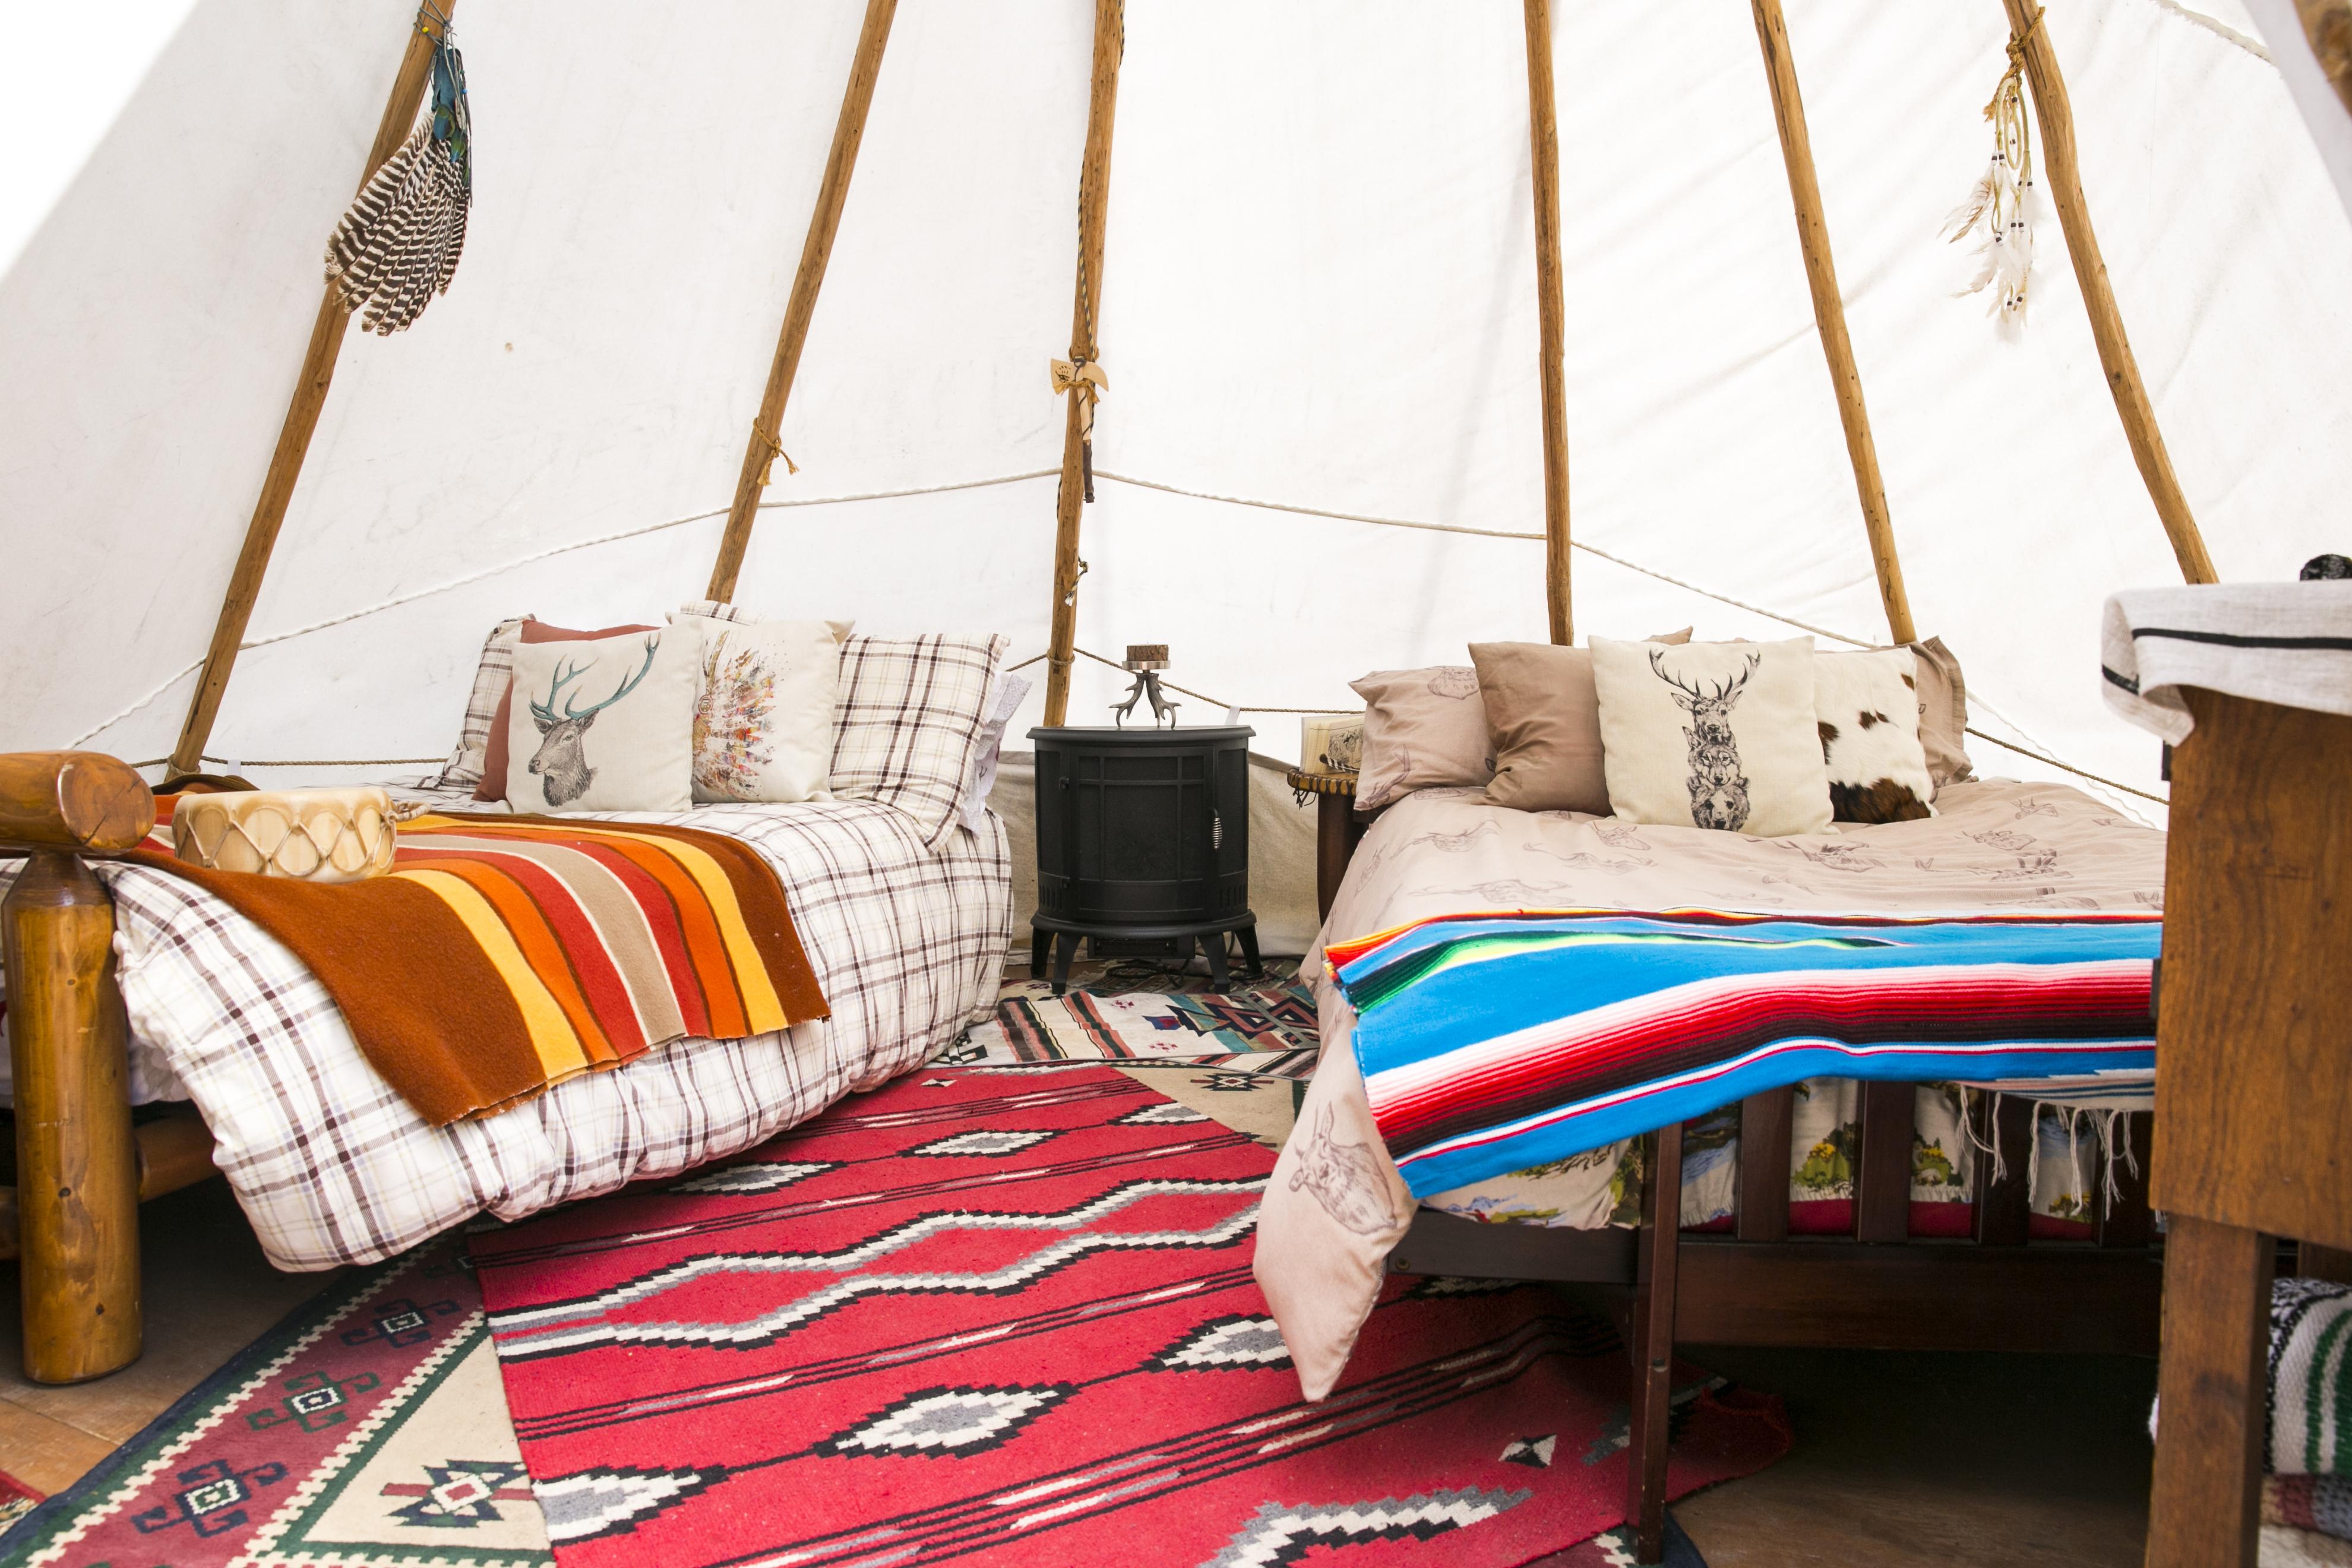 topanga canyon tipi womn. Black Bedroom Furniture Sets. Home Design Ideas